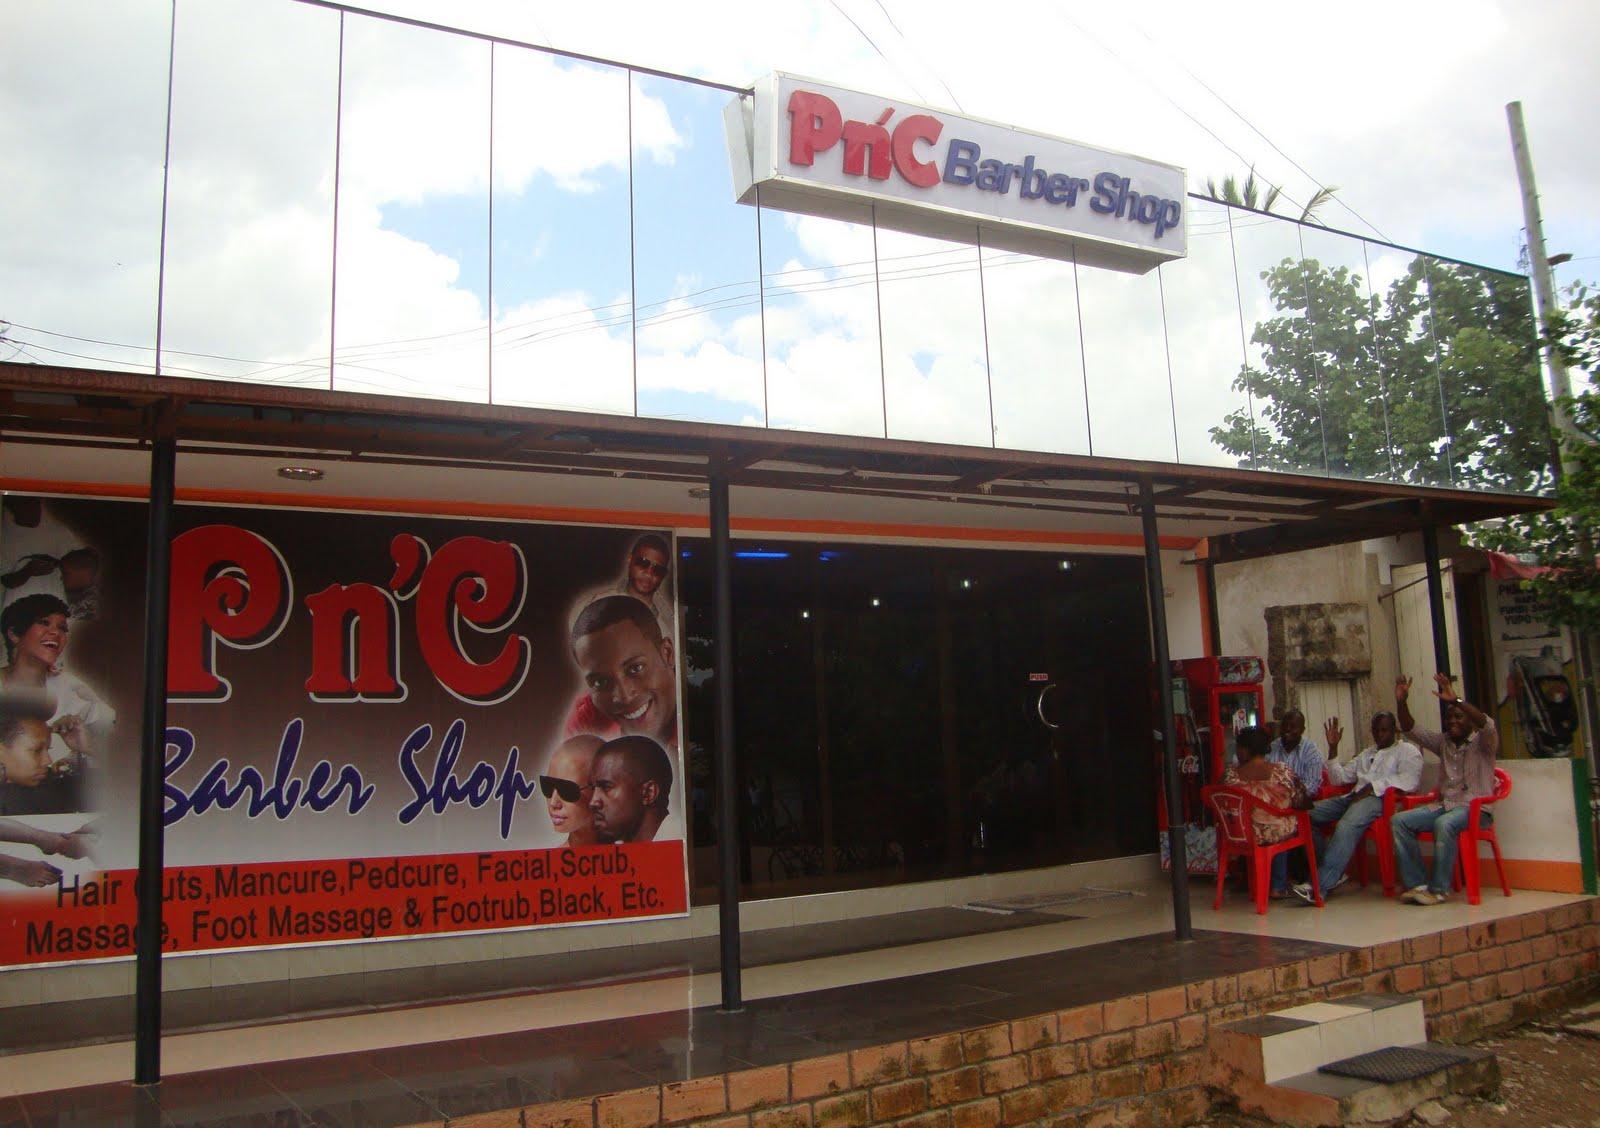 sengo: PnC BARBER SHOP MWANZA DUH - NI PAUKWELI